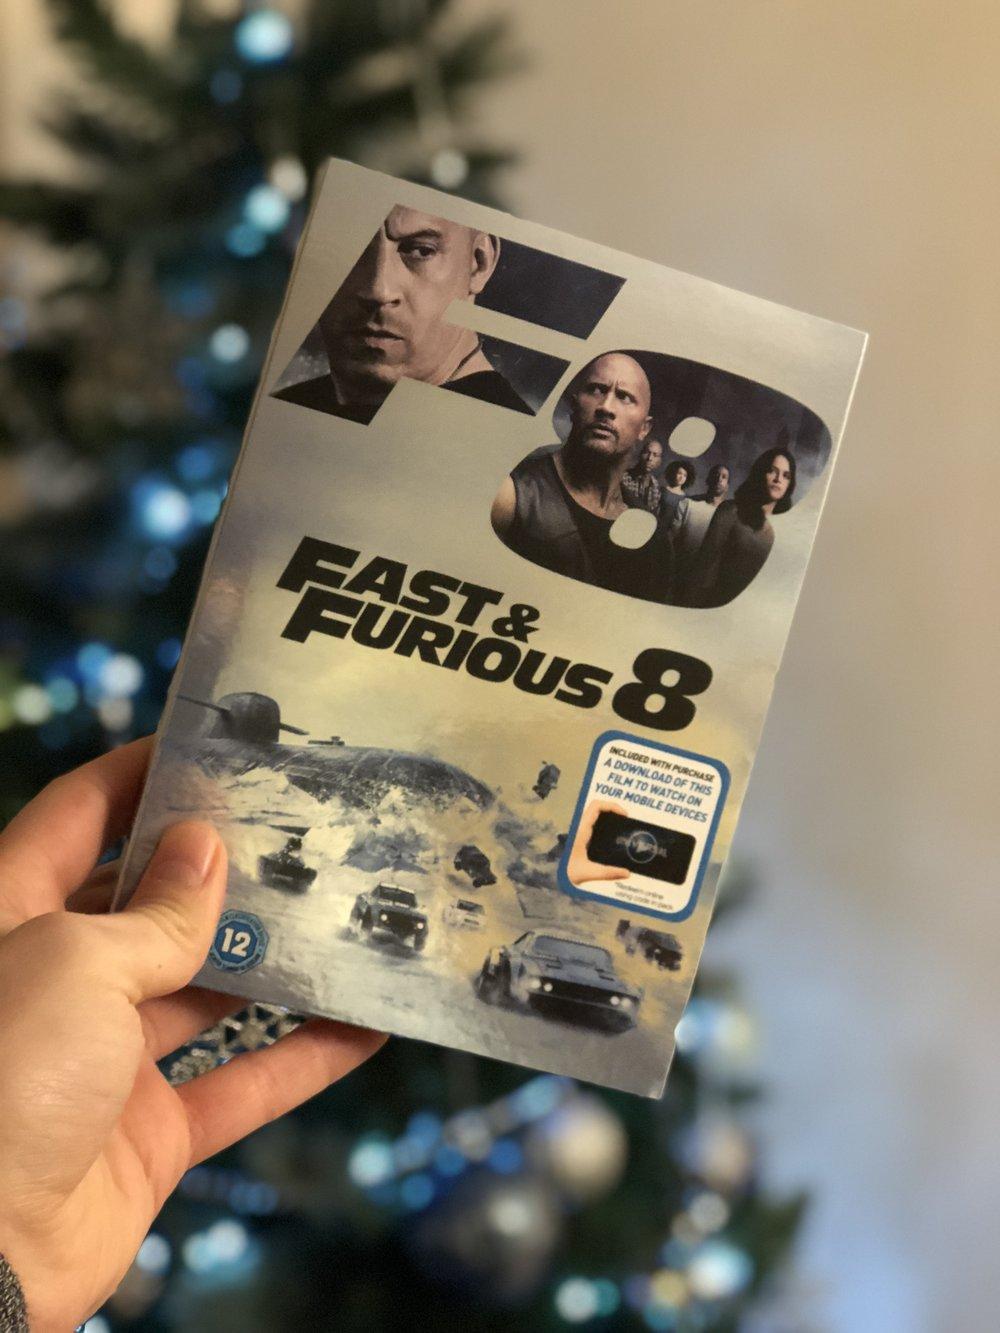 Fast & Furious 8 - £10